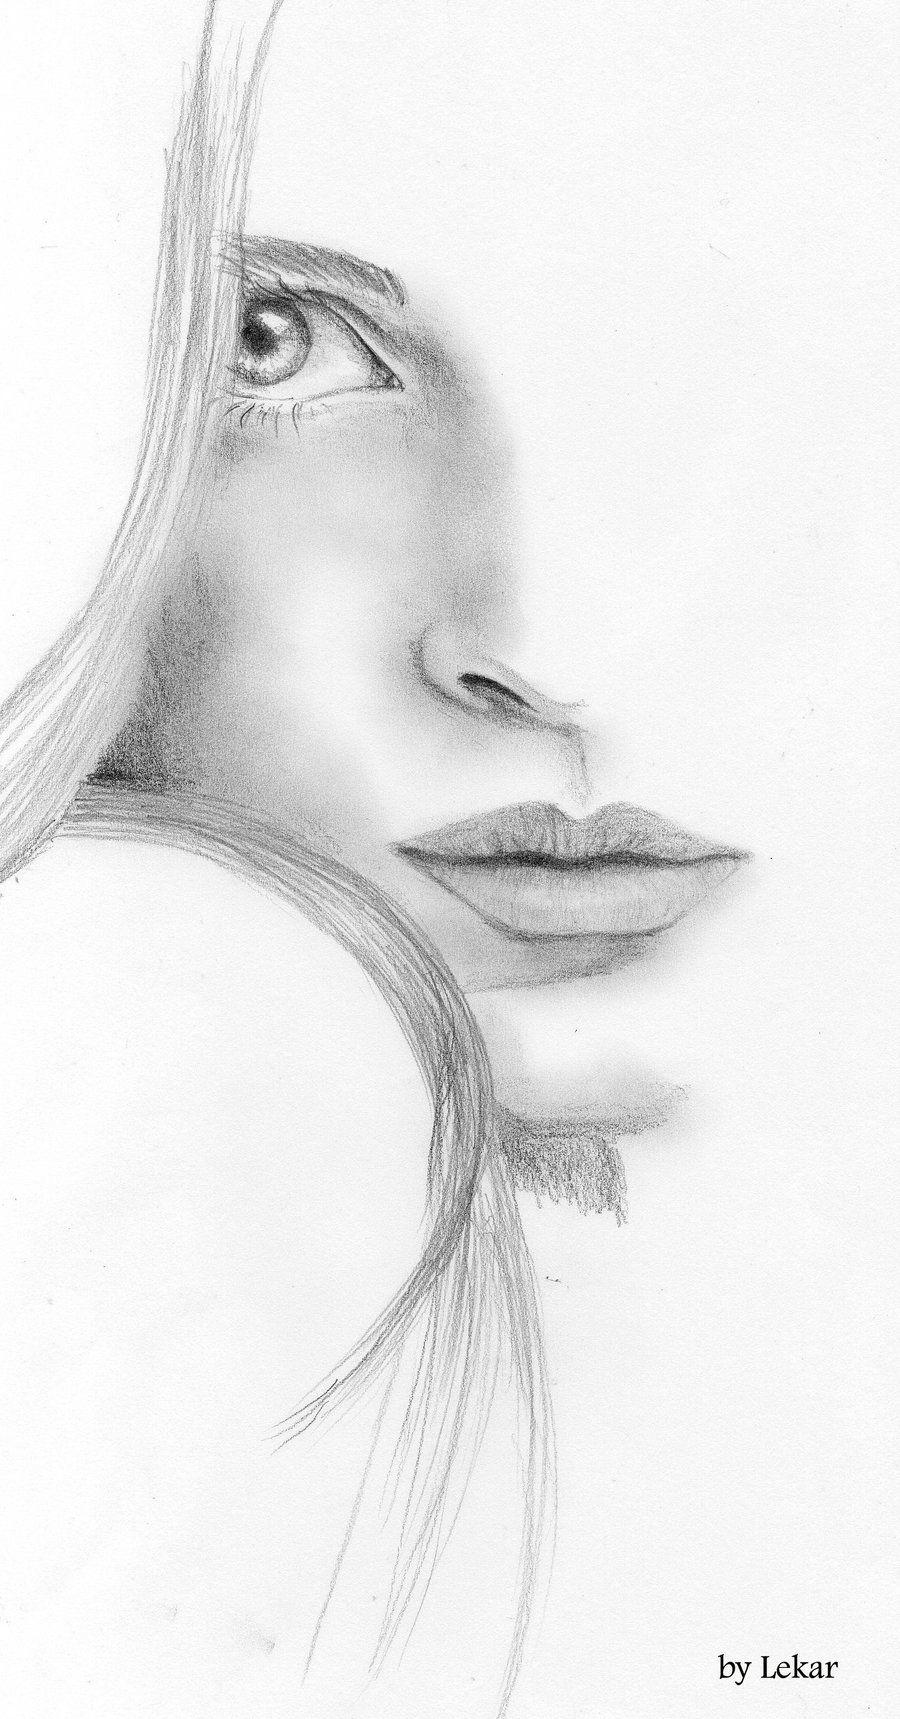 Woman Pencil Sketch : woman, pencil, sketch, Image, Detail, -Woman, Sketch, ~lanfear-chess, DeviantART, Pencil, Drawings,, Sketches,